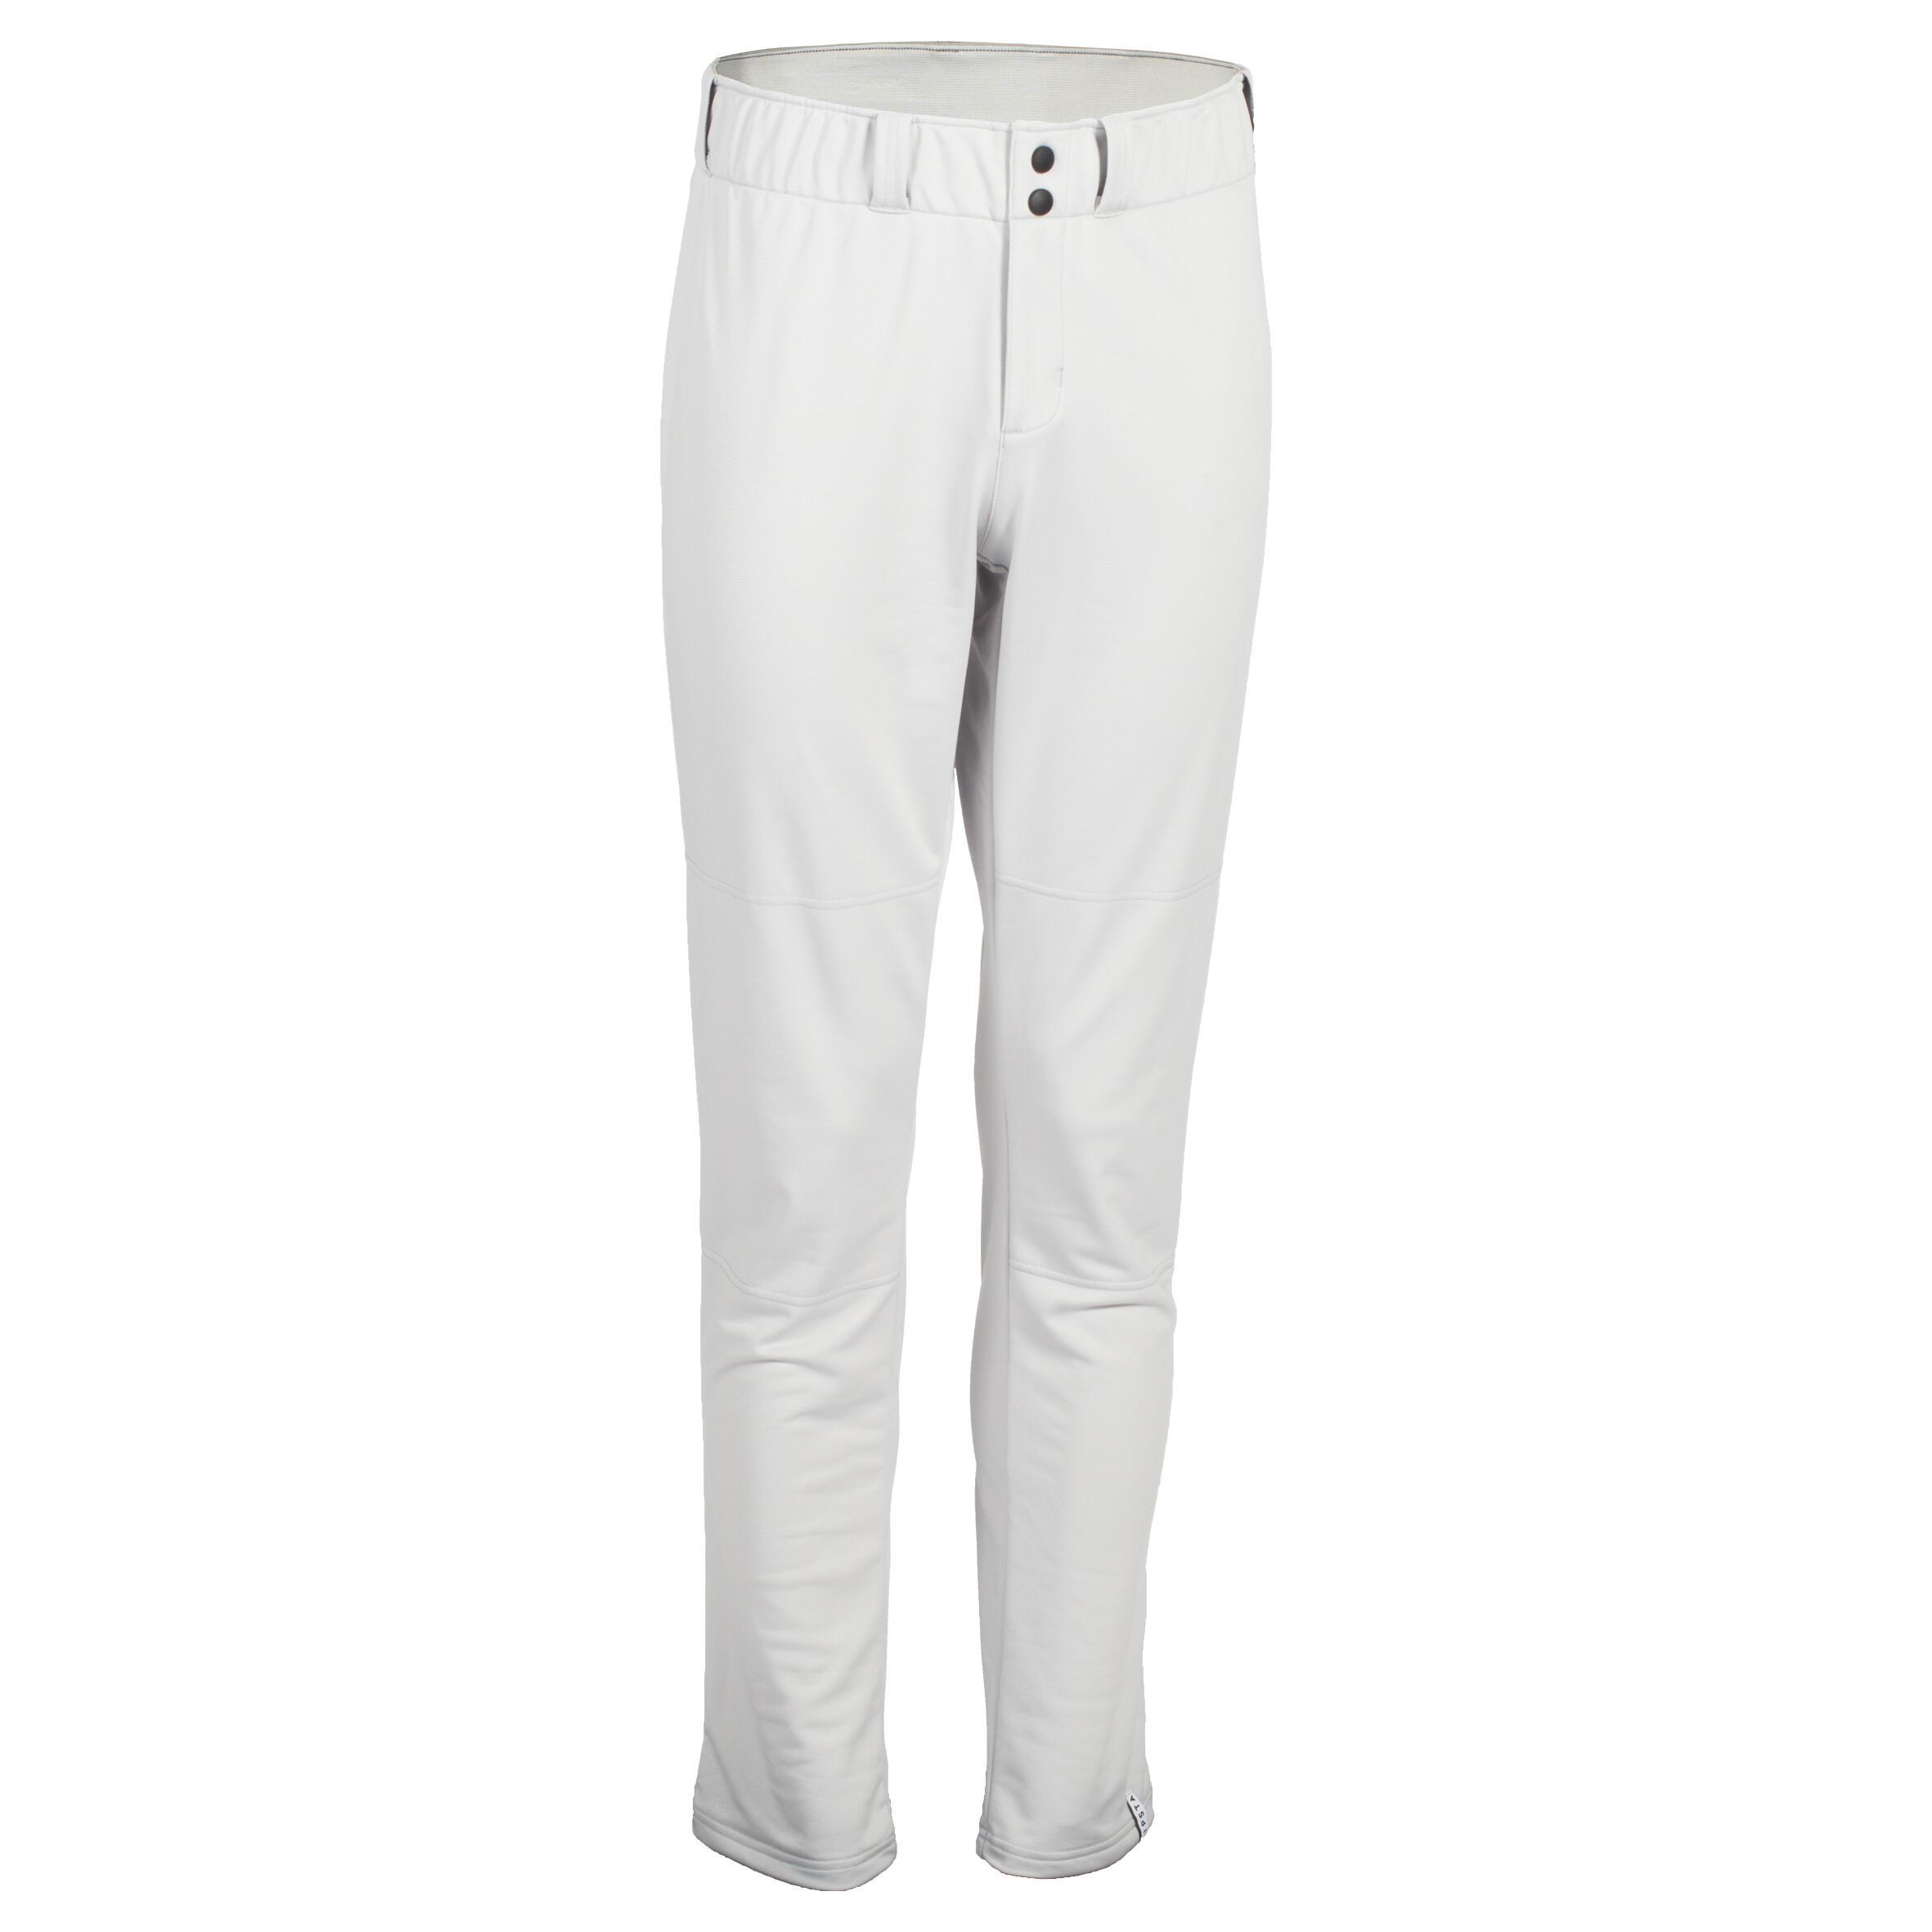 Pantalón de béisbol para adultos BA 550 gris